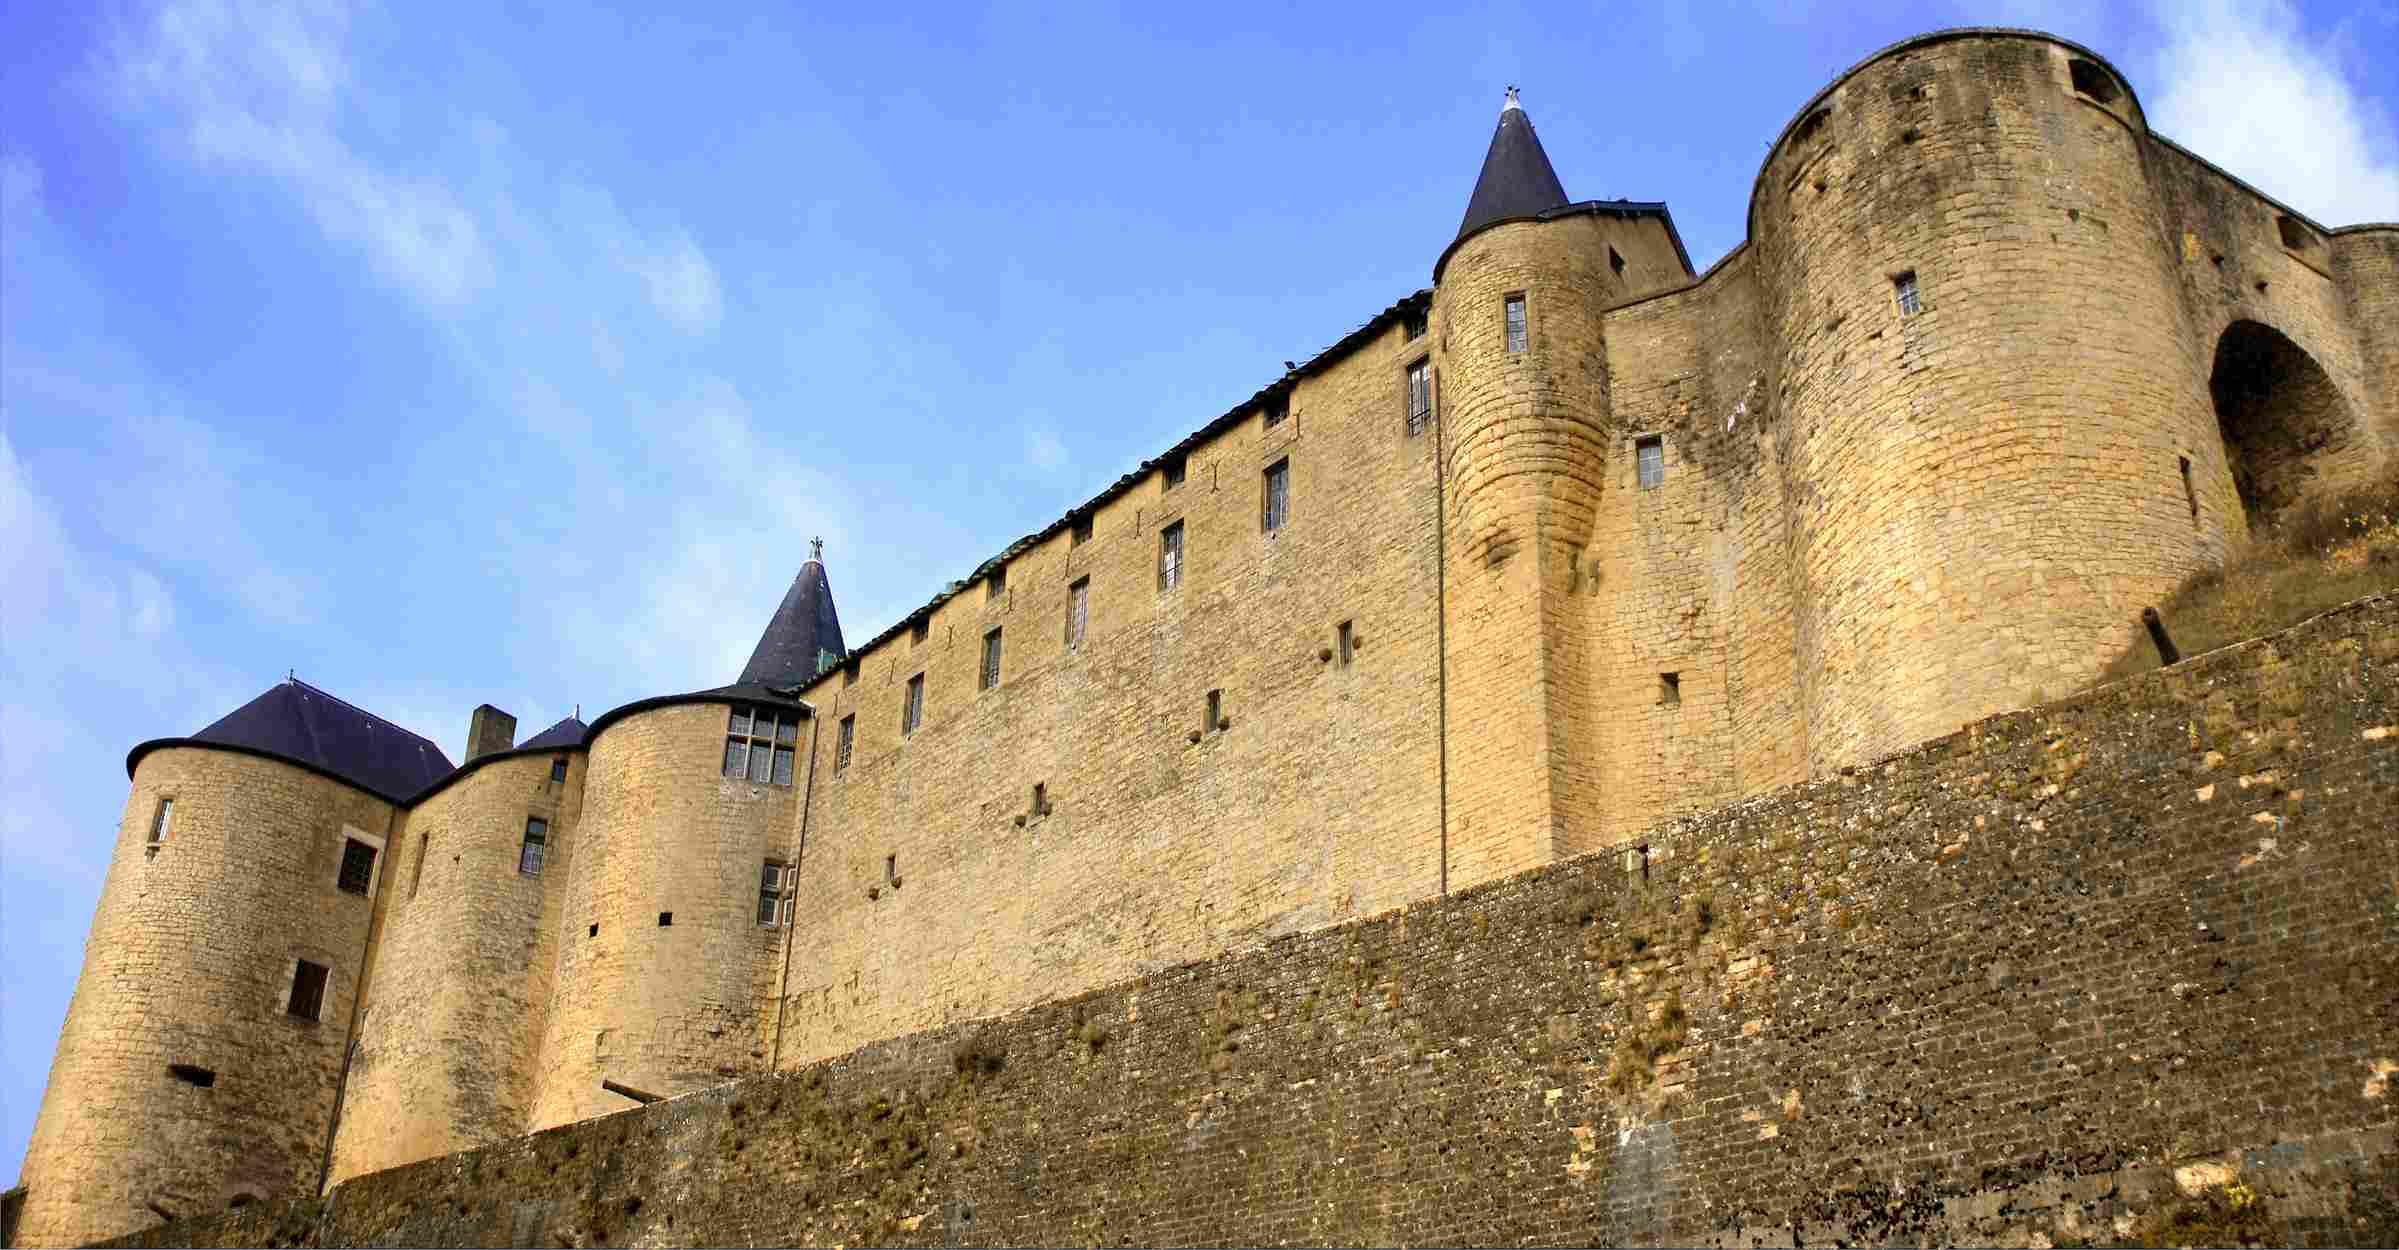 Sedan is the largest castle in Europe